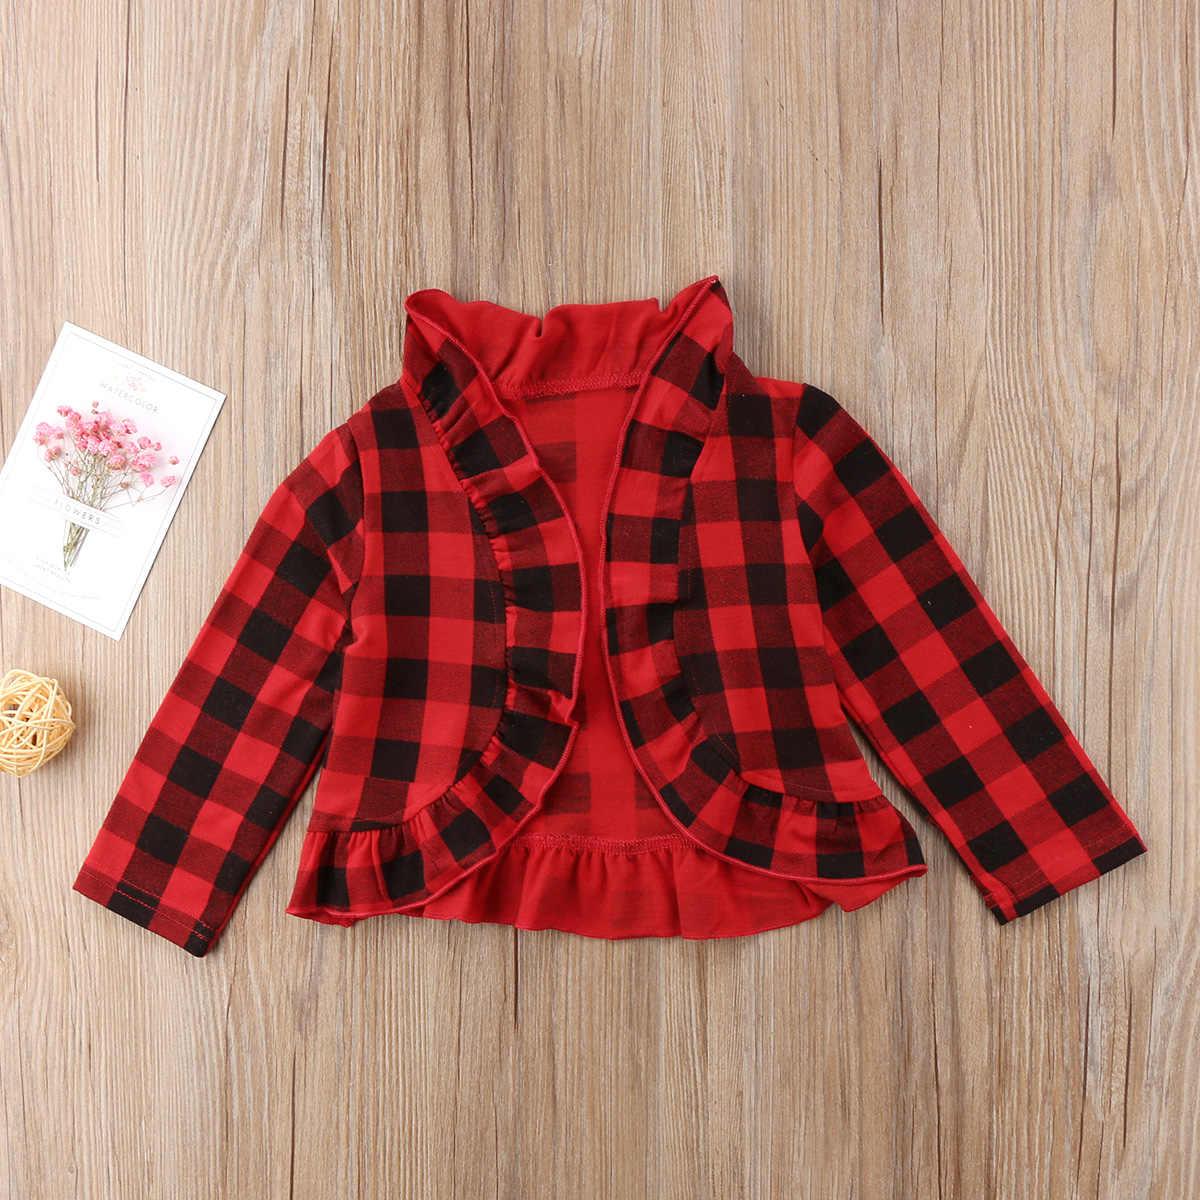 Abrigos de otoño para bebé recién nacido a cuadros niños niñas abrigo de manga larga princesa volantes suéter Fasgion dulce chaqueta de ropa para niños